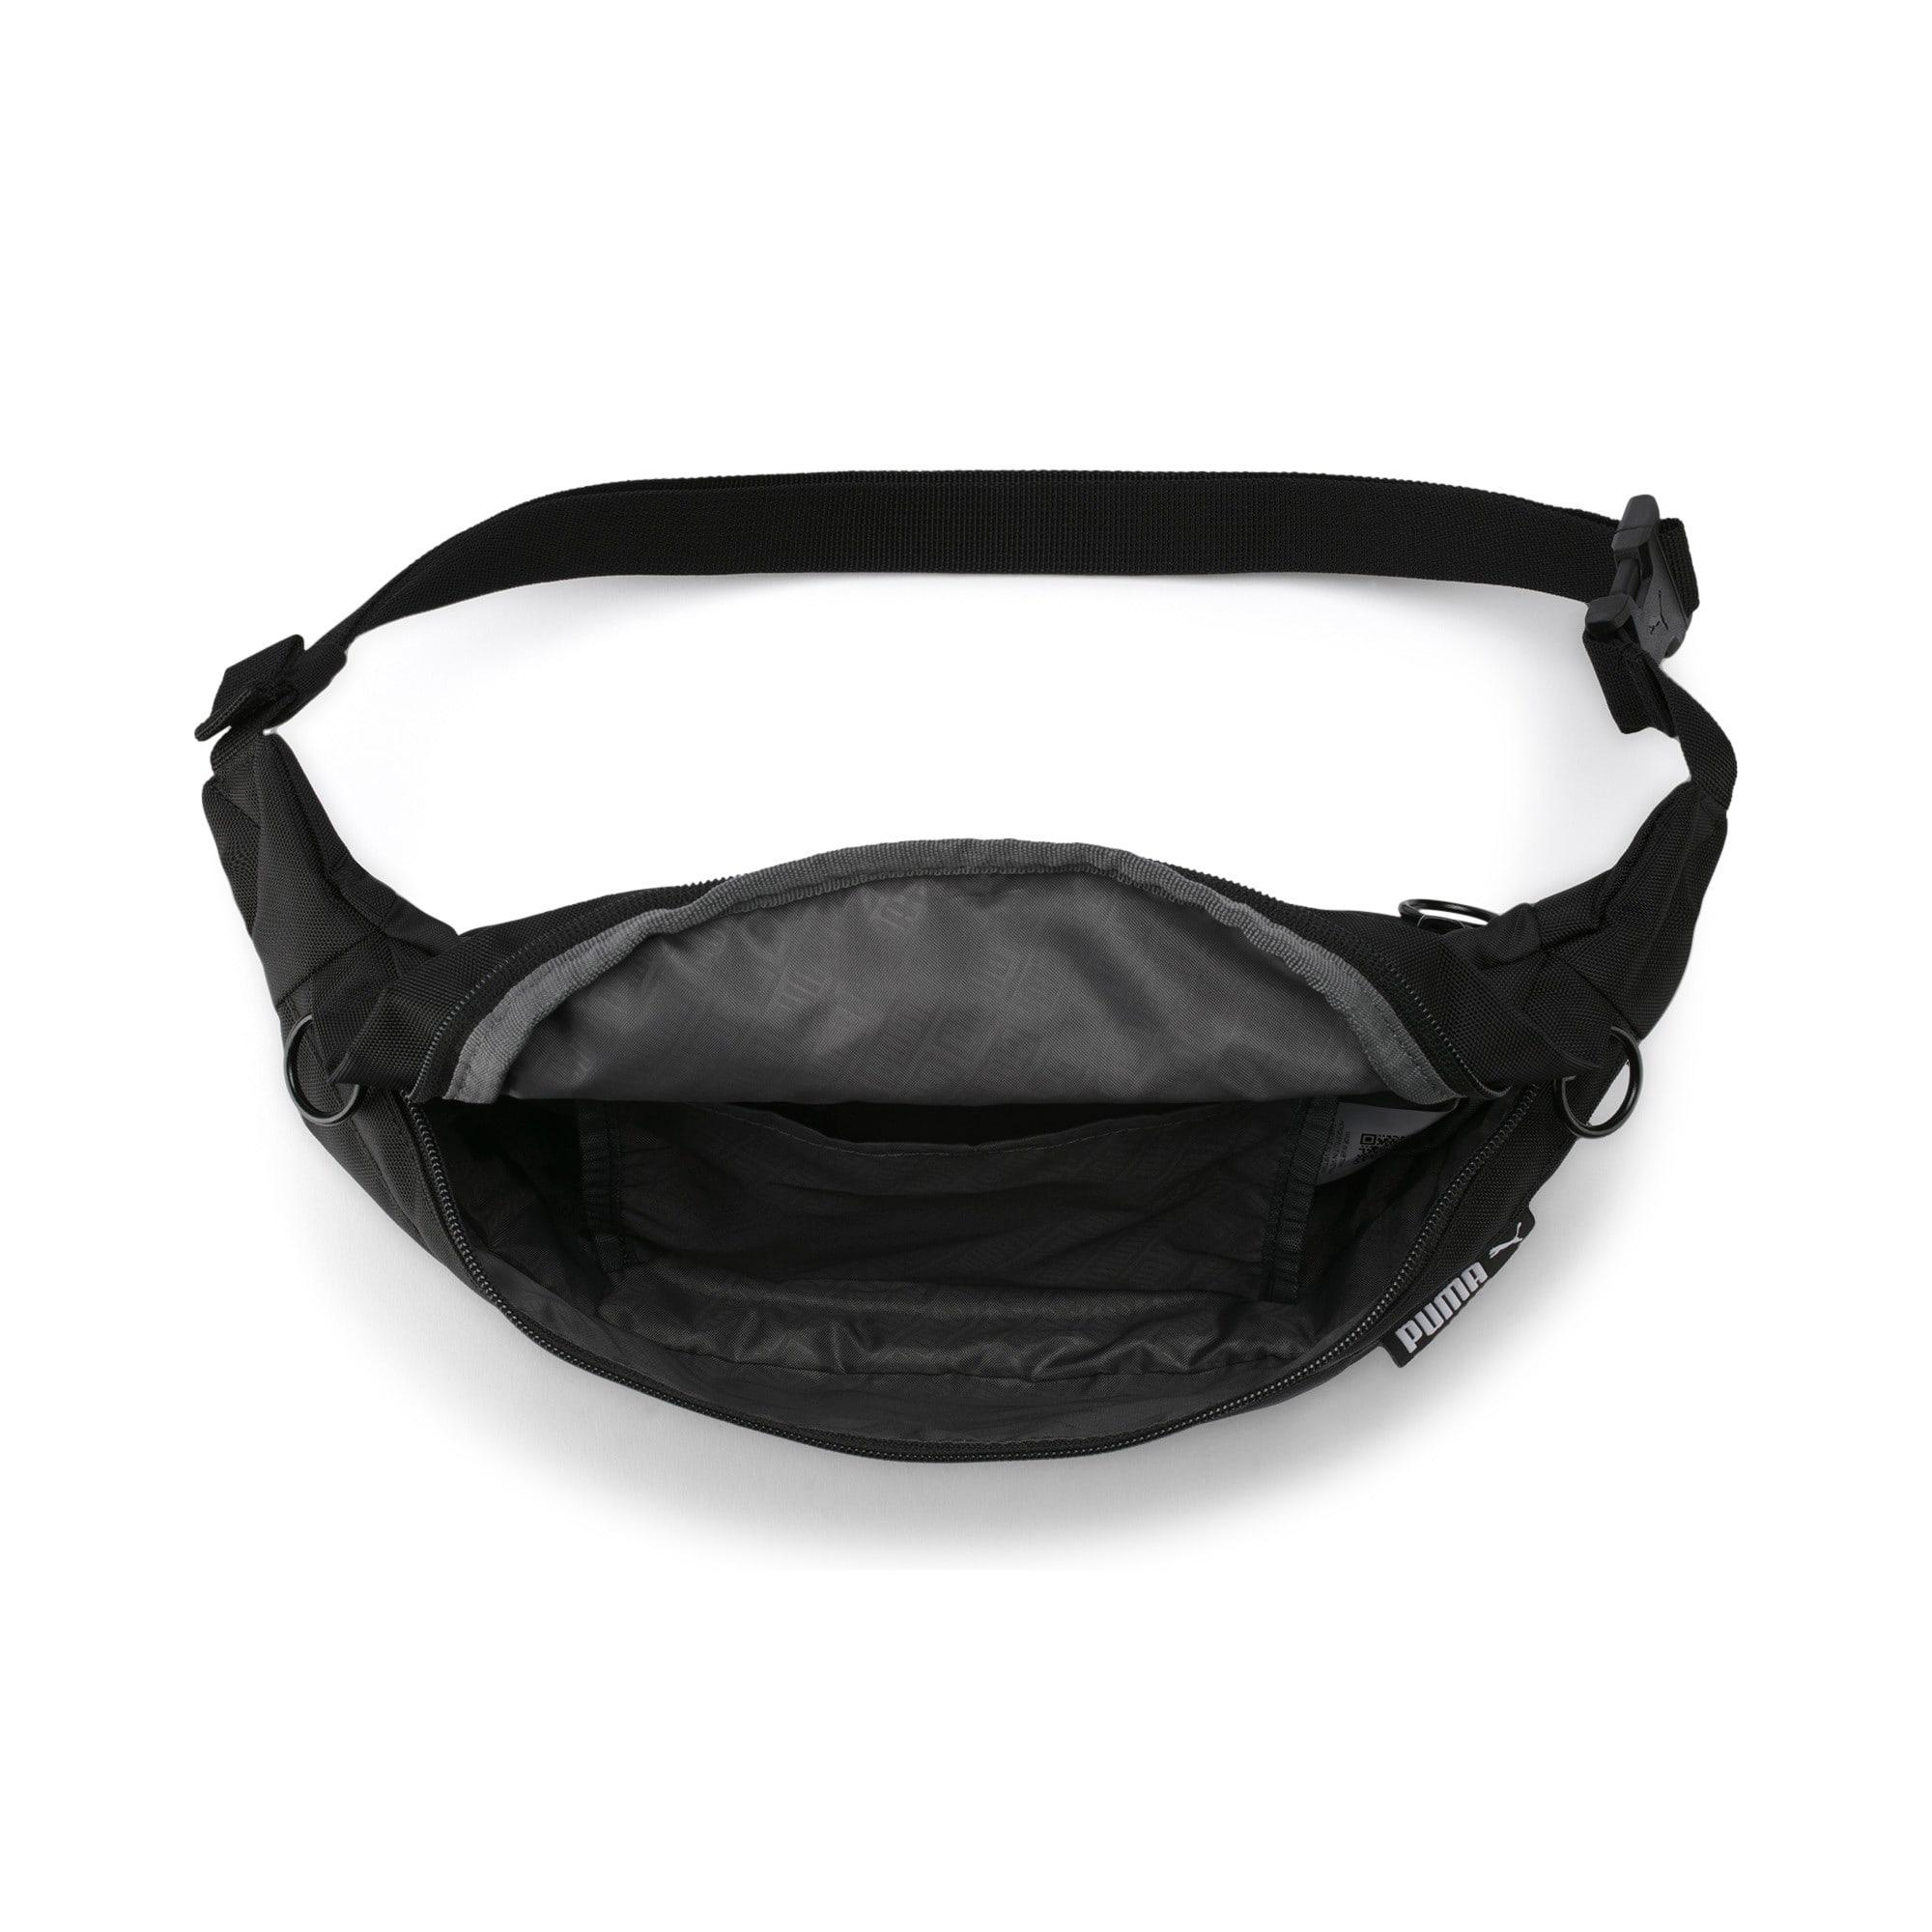 Thumbnail 3 of Originals Cell Waist Bag, Puma Black-Cell OG SL9, medium